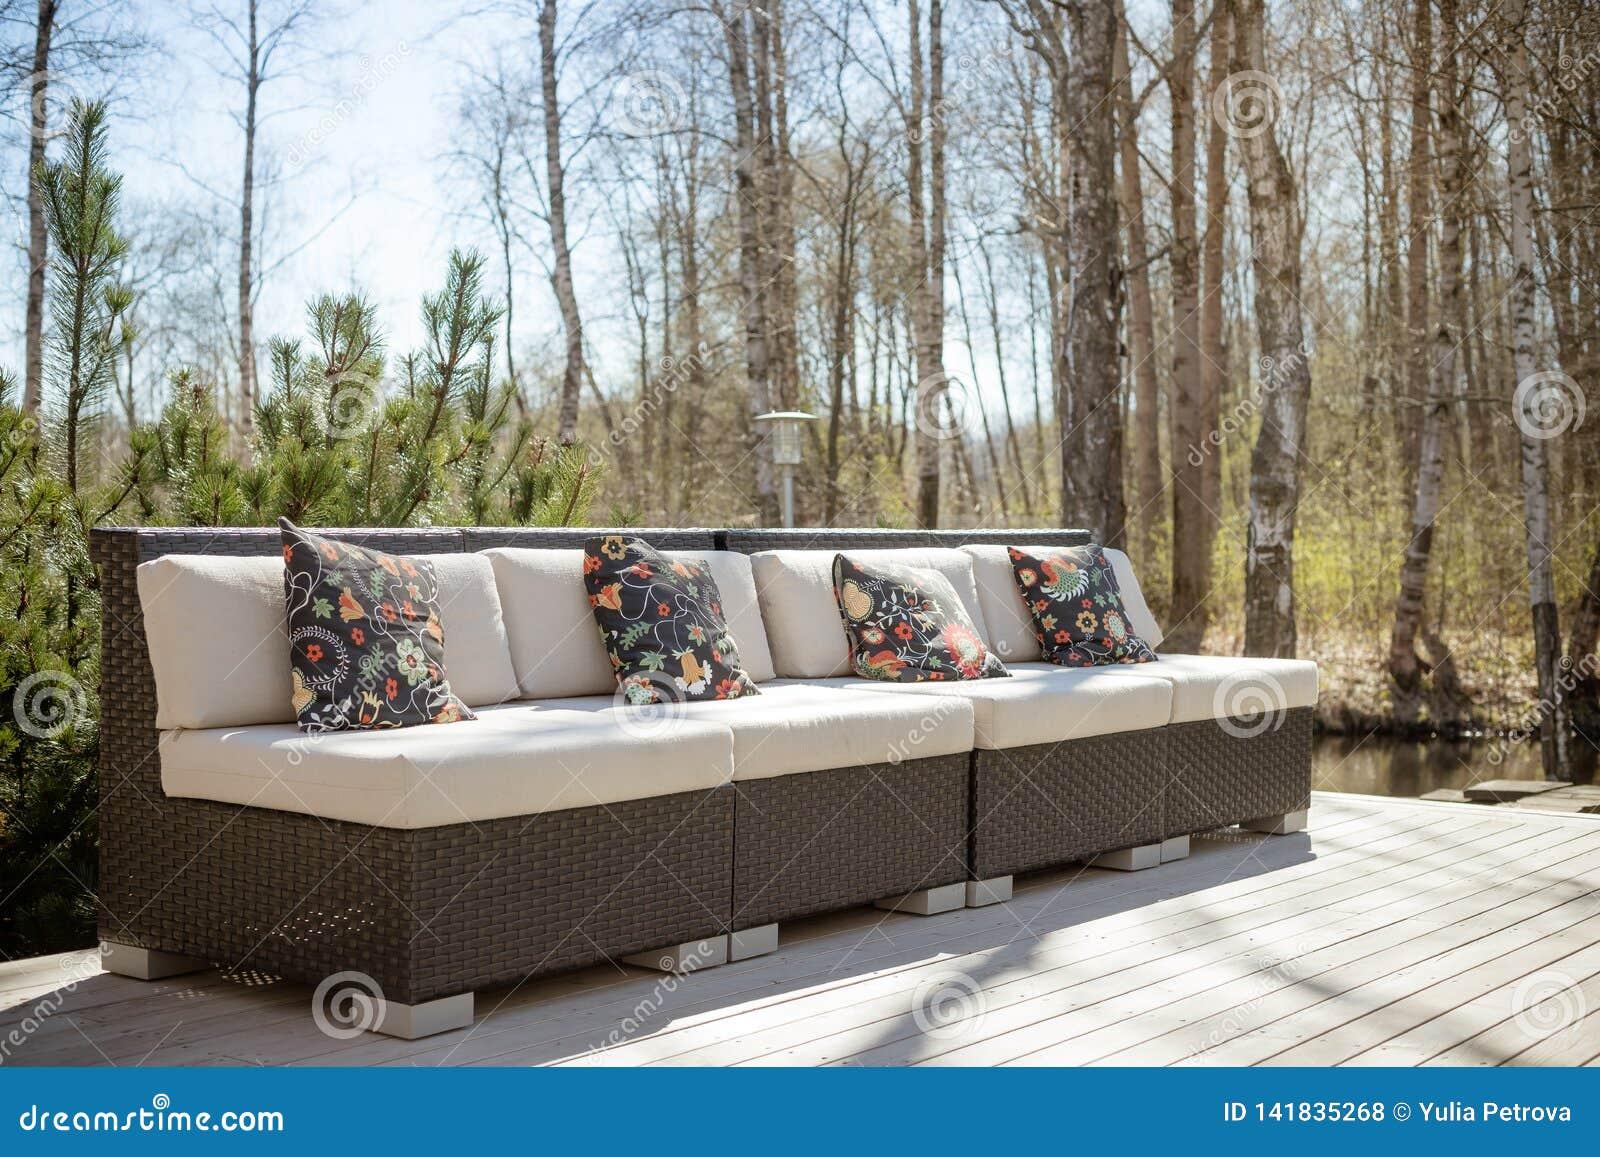 L Anfora Rattan Amphoren Lounge.Large Terrace Patio With Rattan Garden Furniture Set Wooden Garden